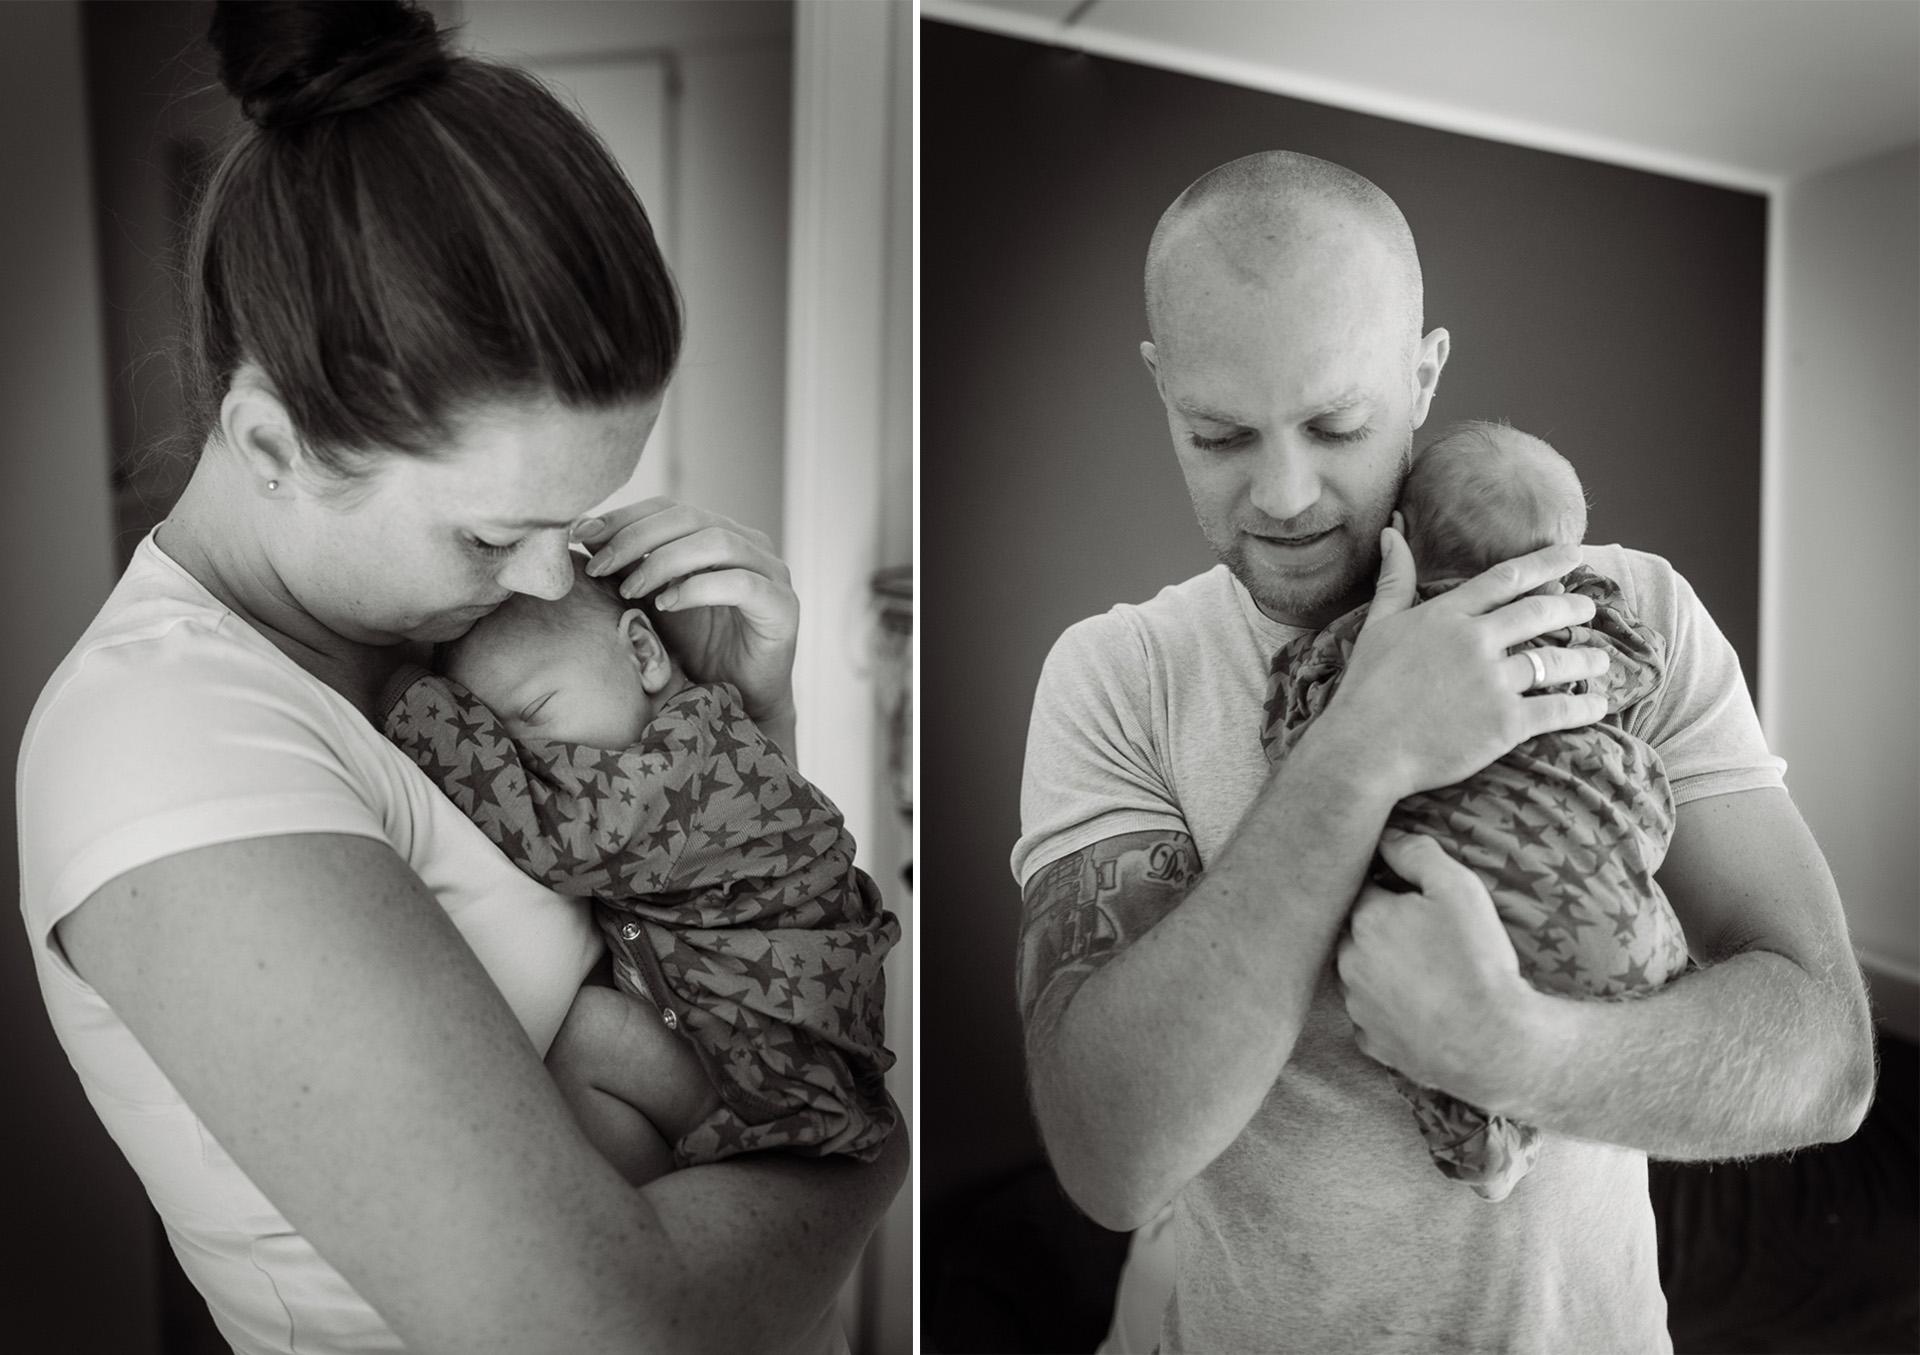 Theo_nyfødt_newborn_baby_29